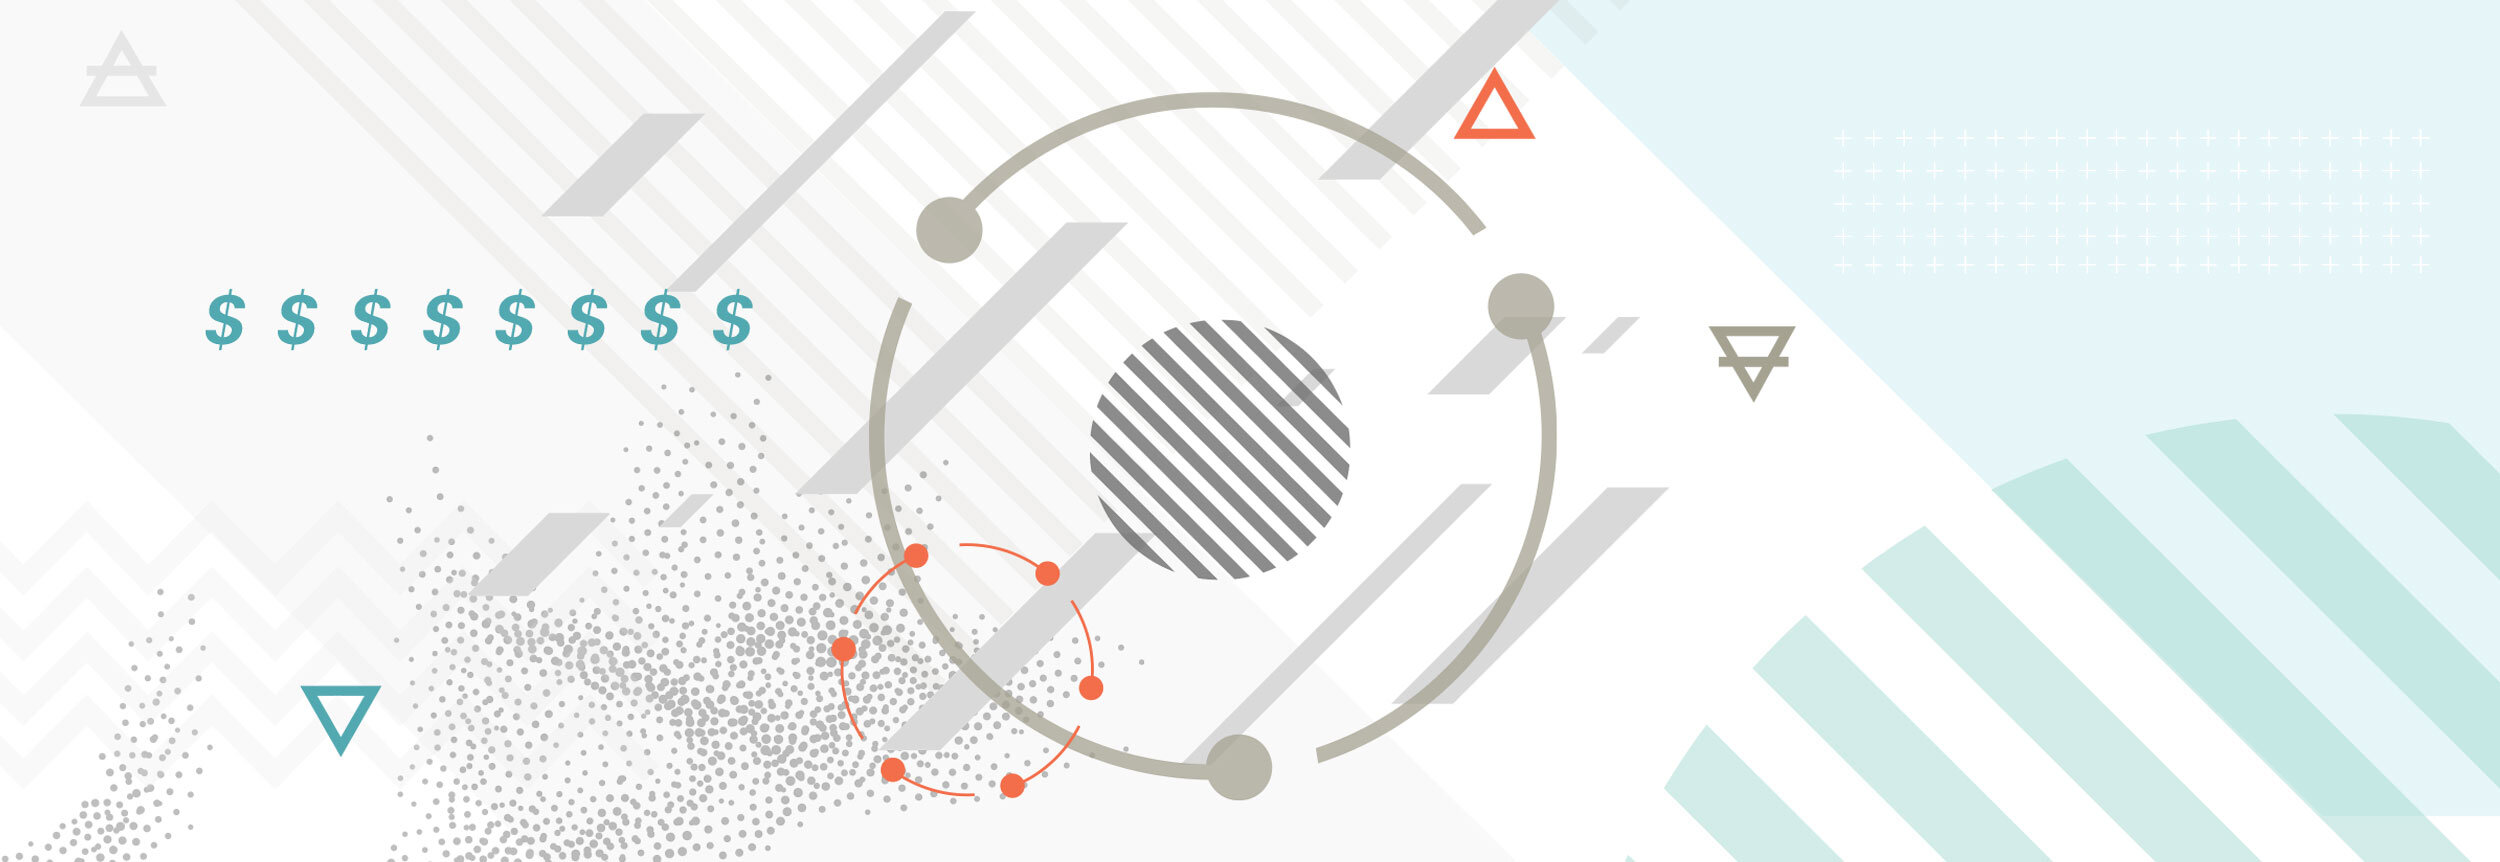 blog-sustainability-strategy-landscape-banner.jpg